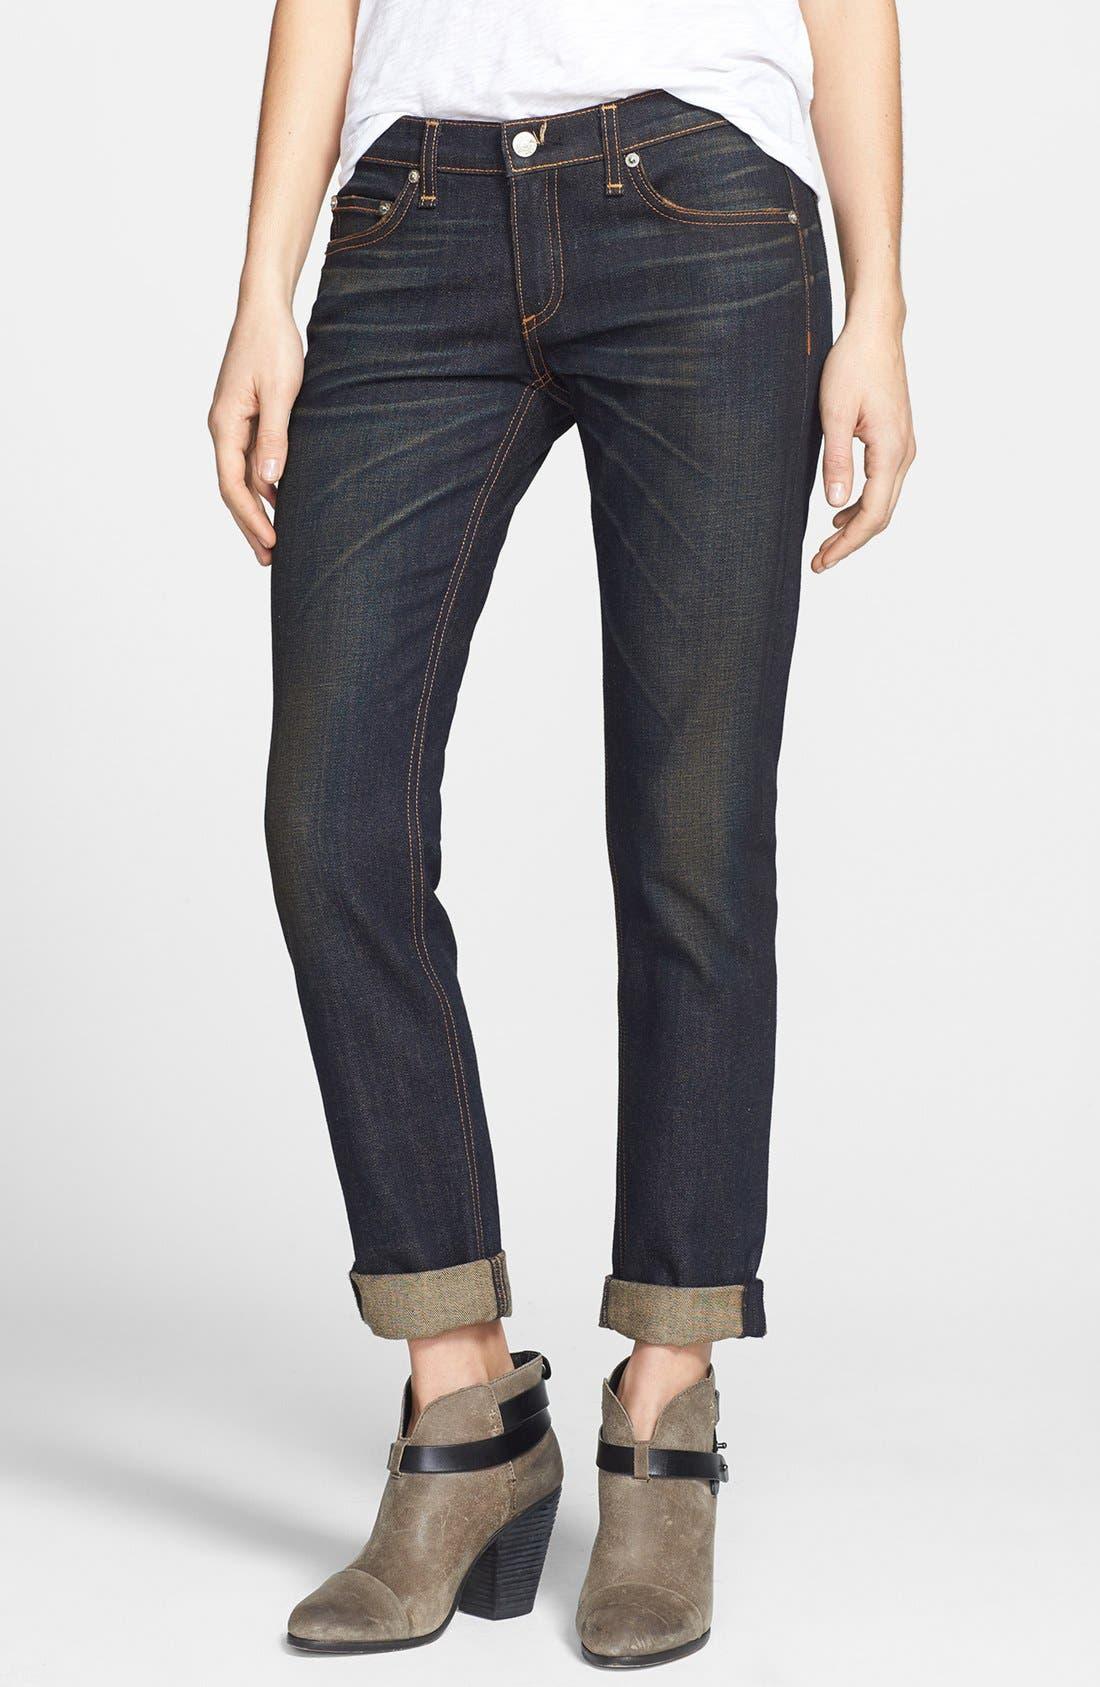 Alternate Image 1 Selected - rag & bone/JEAN 'The Dre' Slim Fit Boyfriend Jeans (Charing)